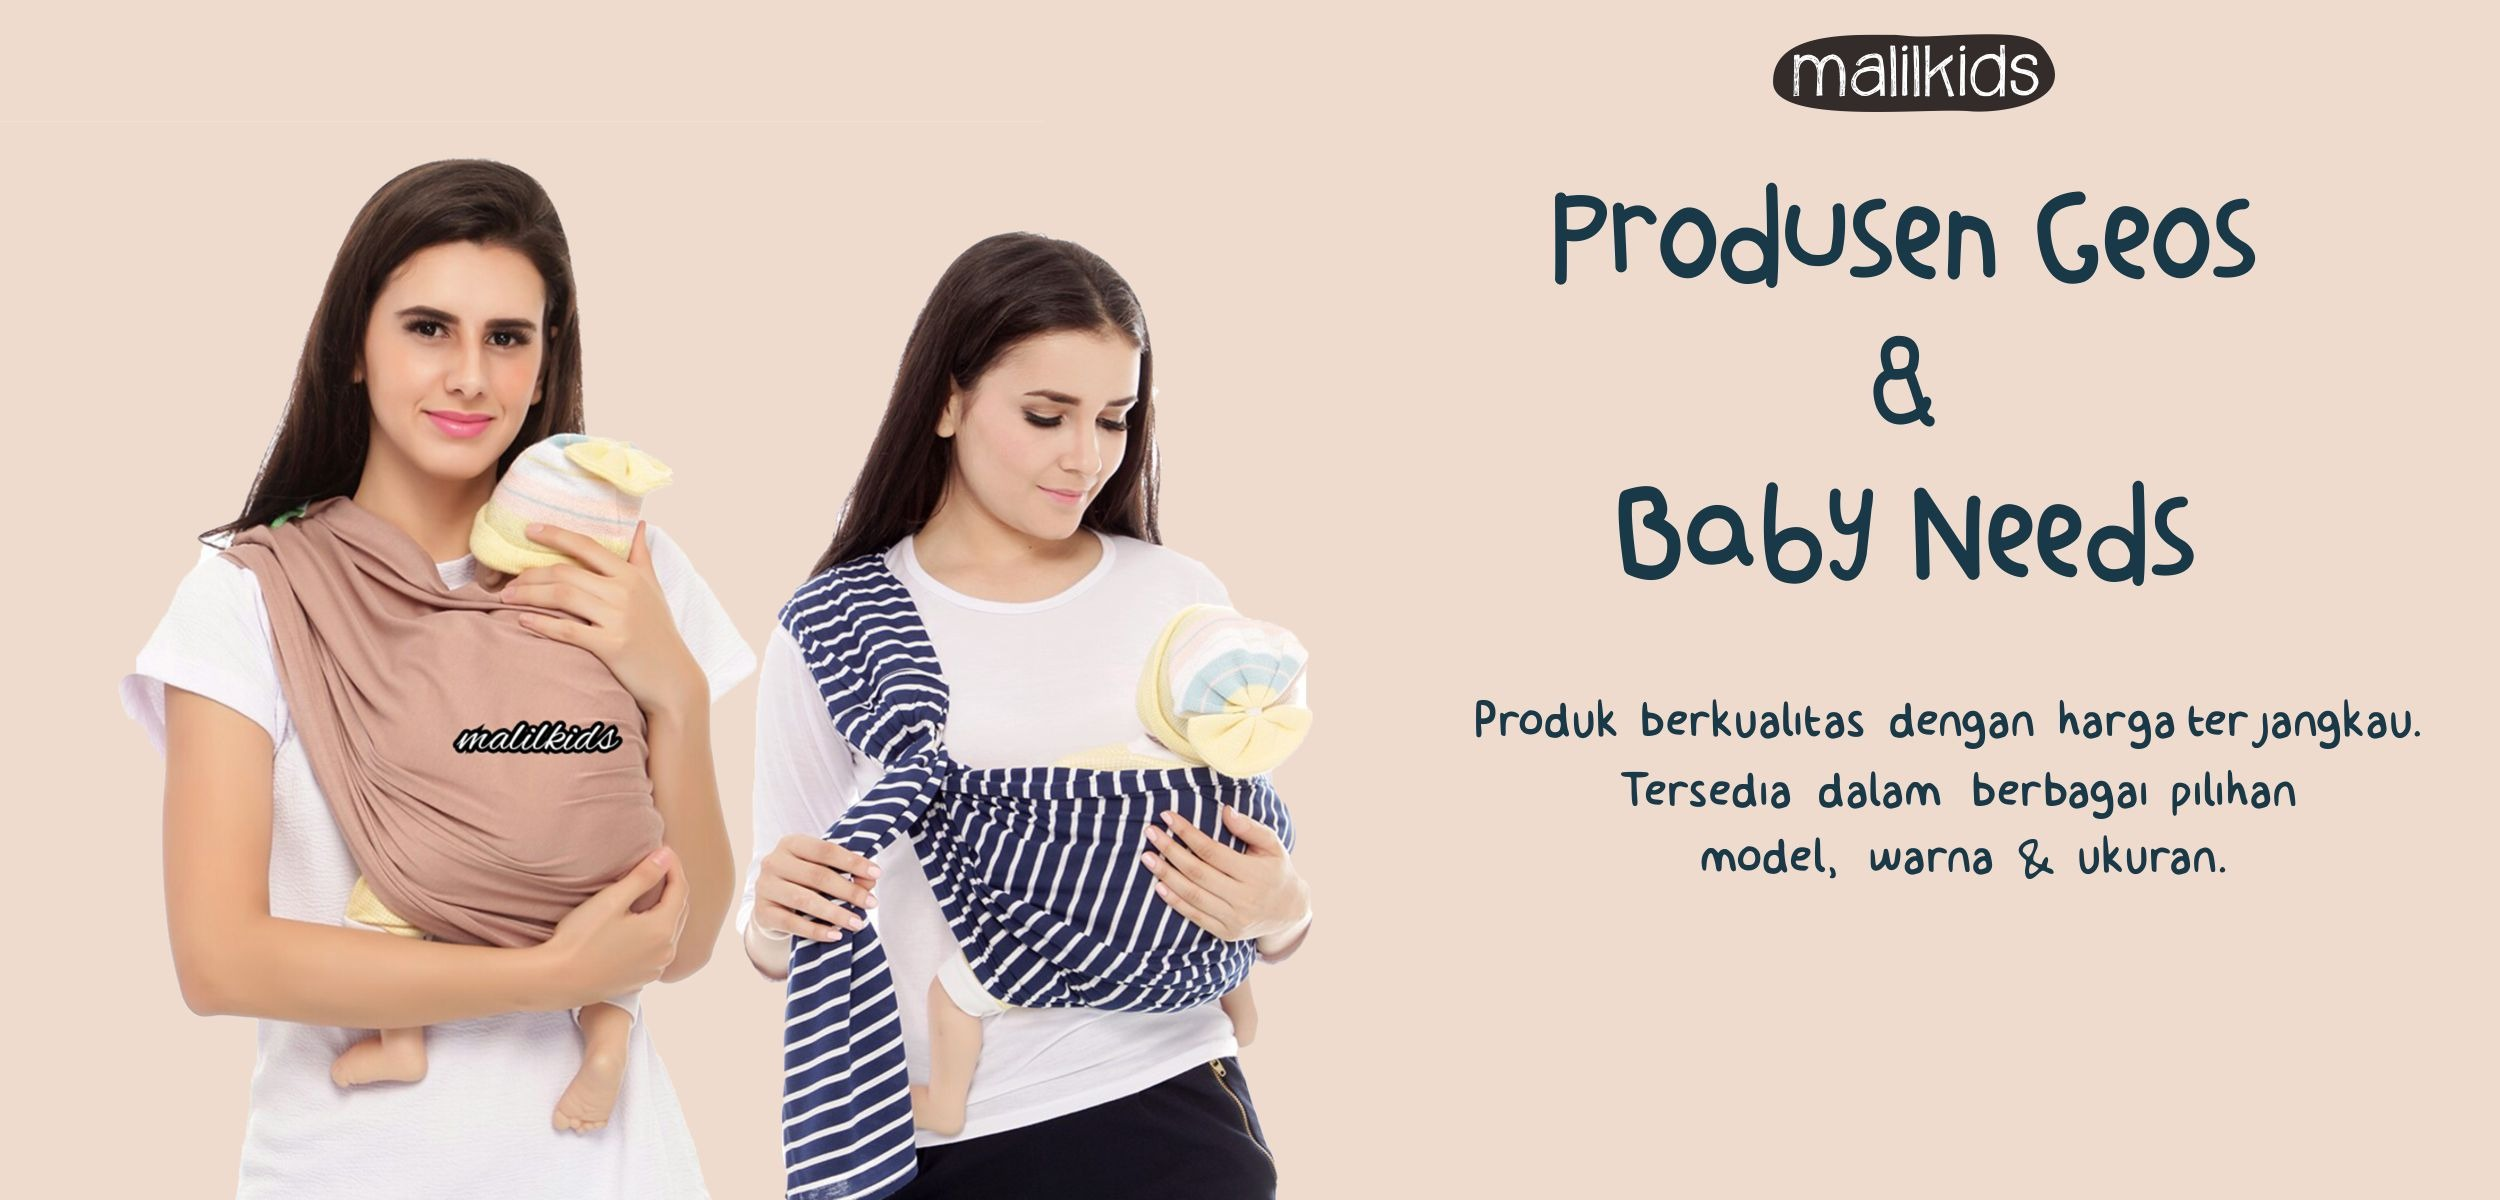 Rp89.000Gratis Pouch! Size L - Malilkids Geos / Gendongan Kaos Premium / Gendongan Instan - Model Lil Love Grey